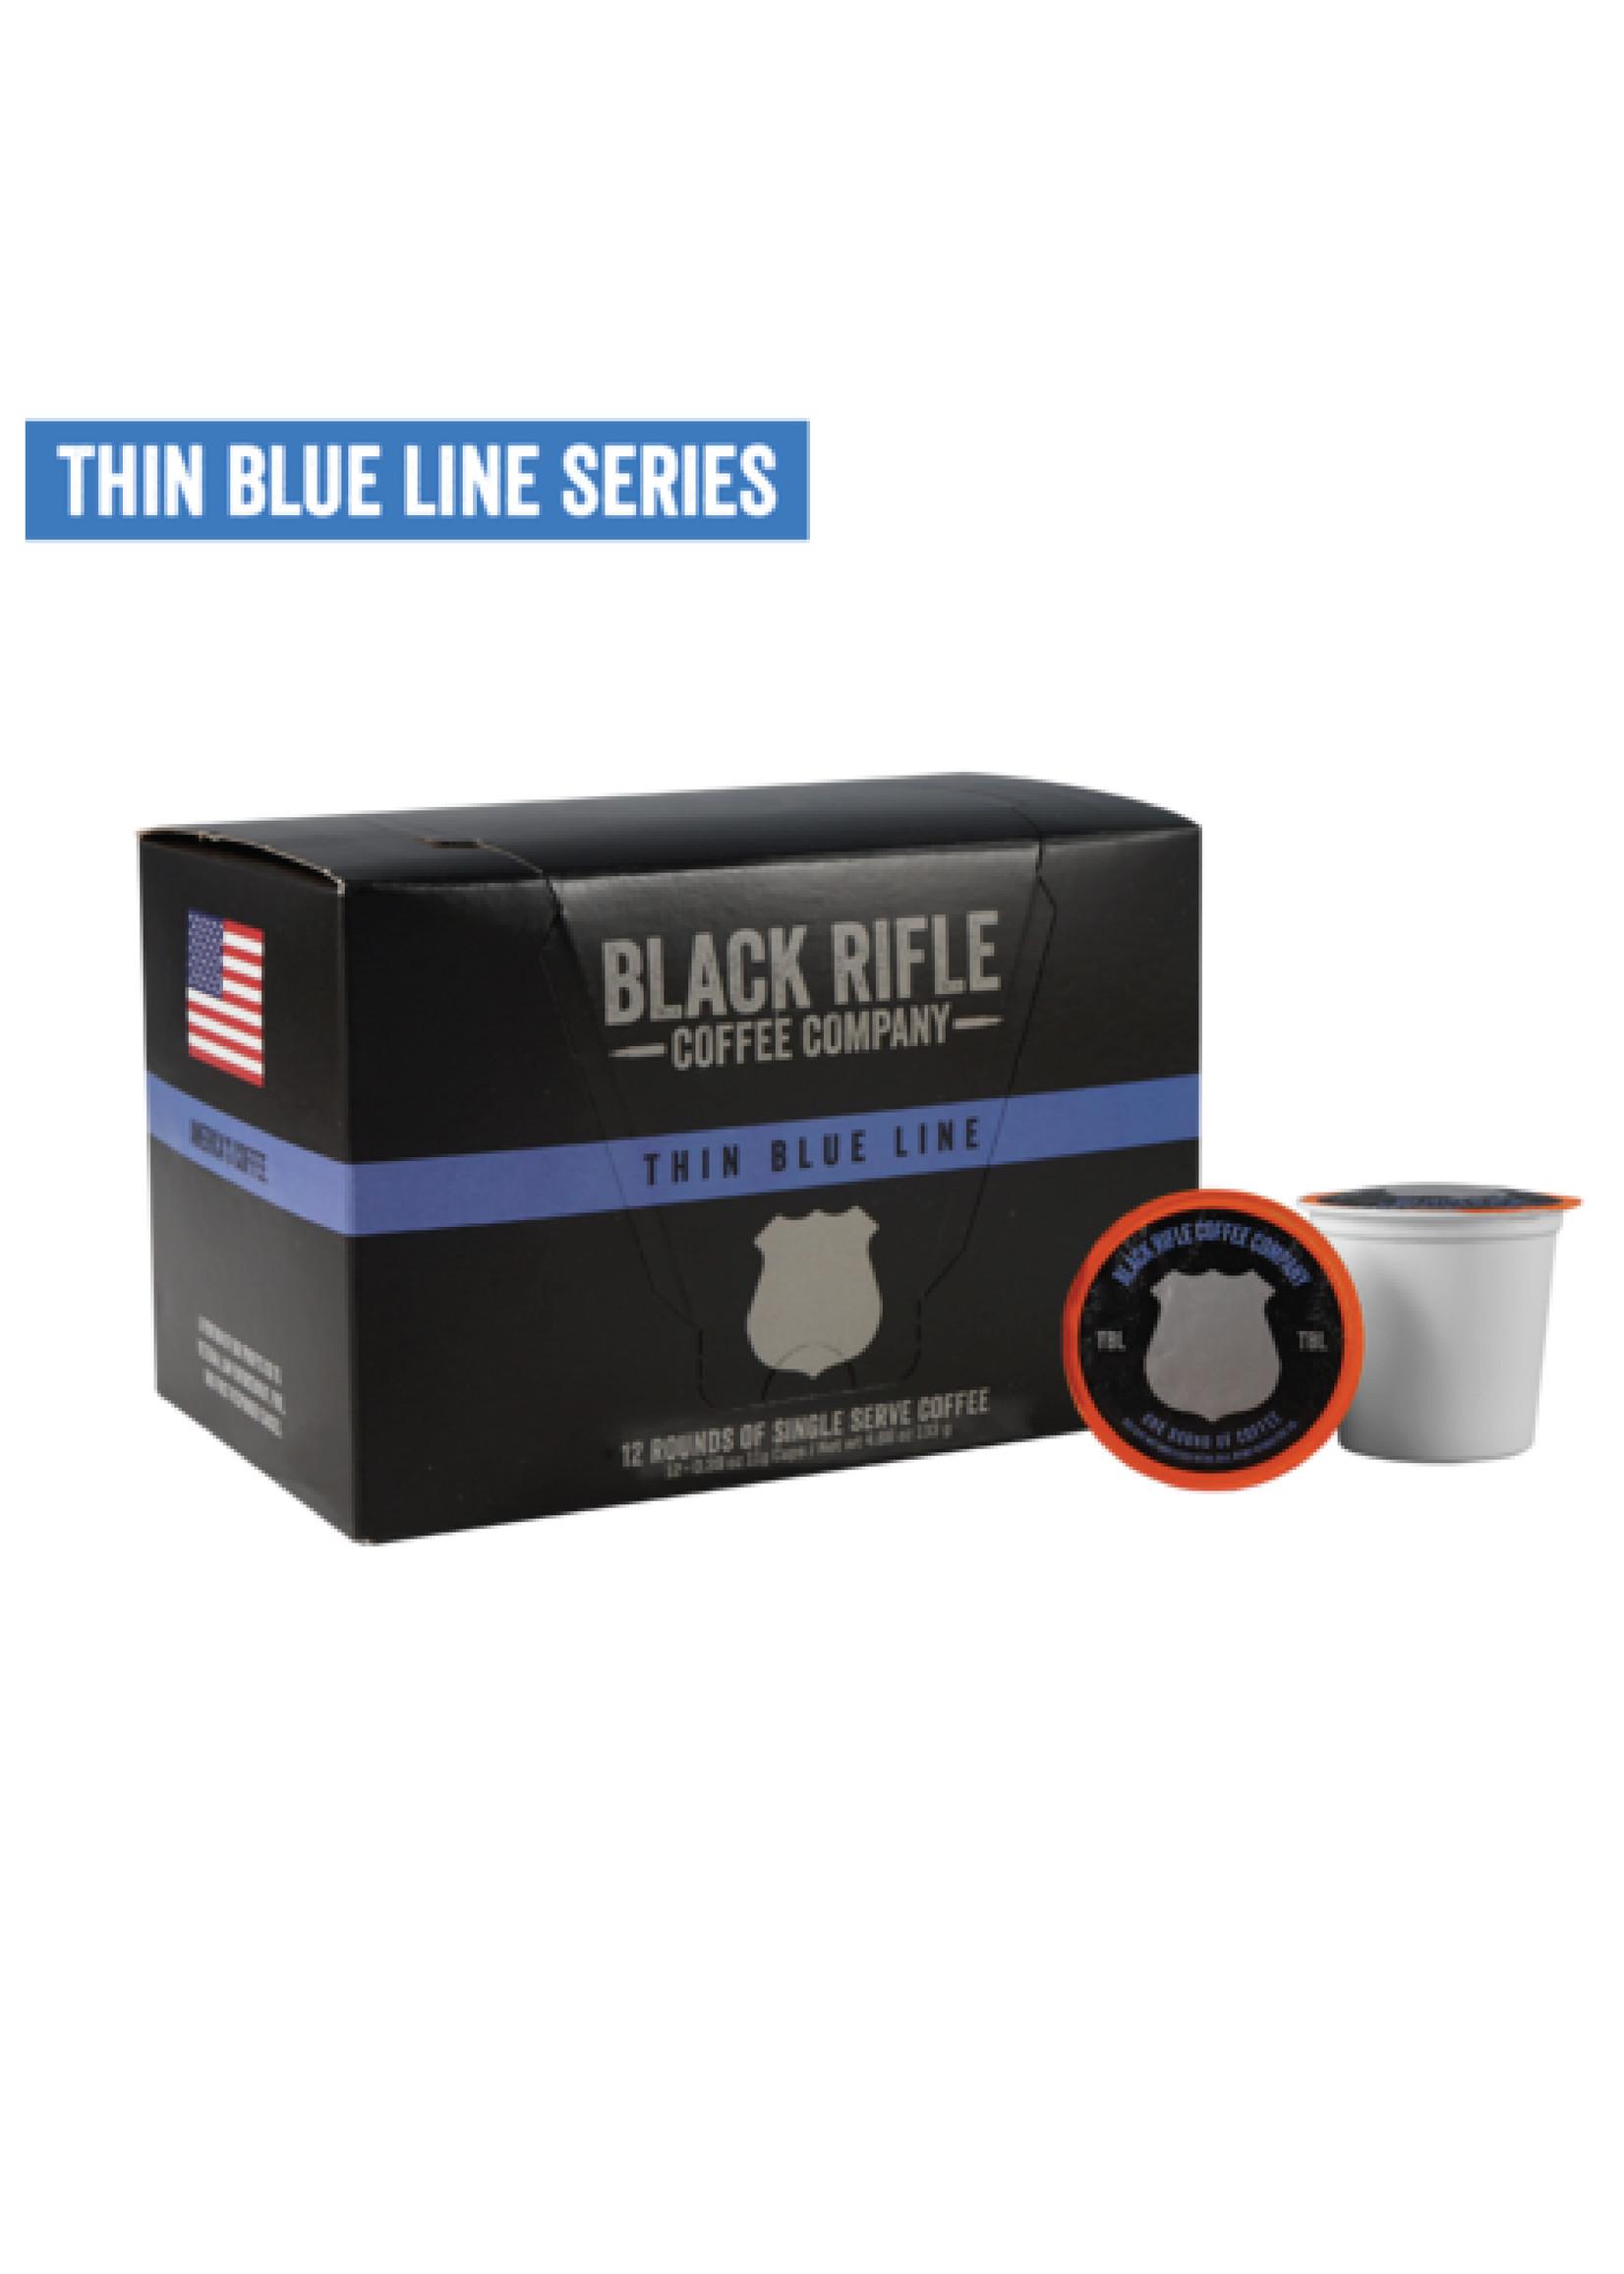 Black Rifle Coffee Company Black Rifle Coffee Company Thin Blue Line Coffee Rounds 12ct